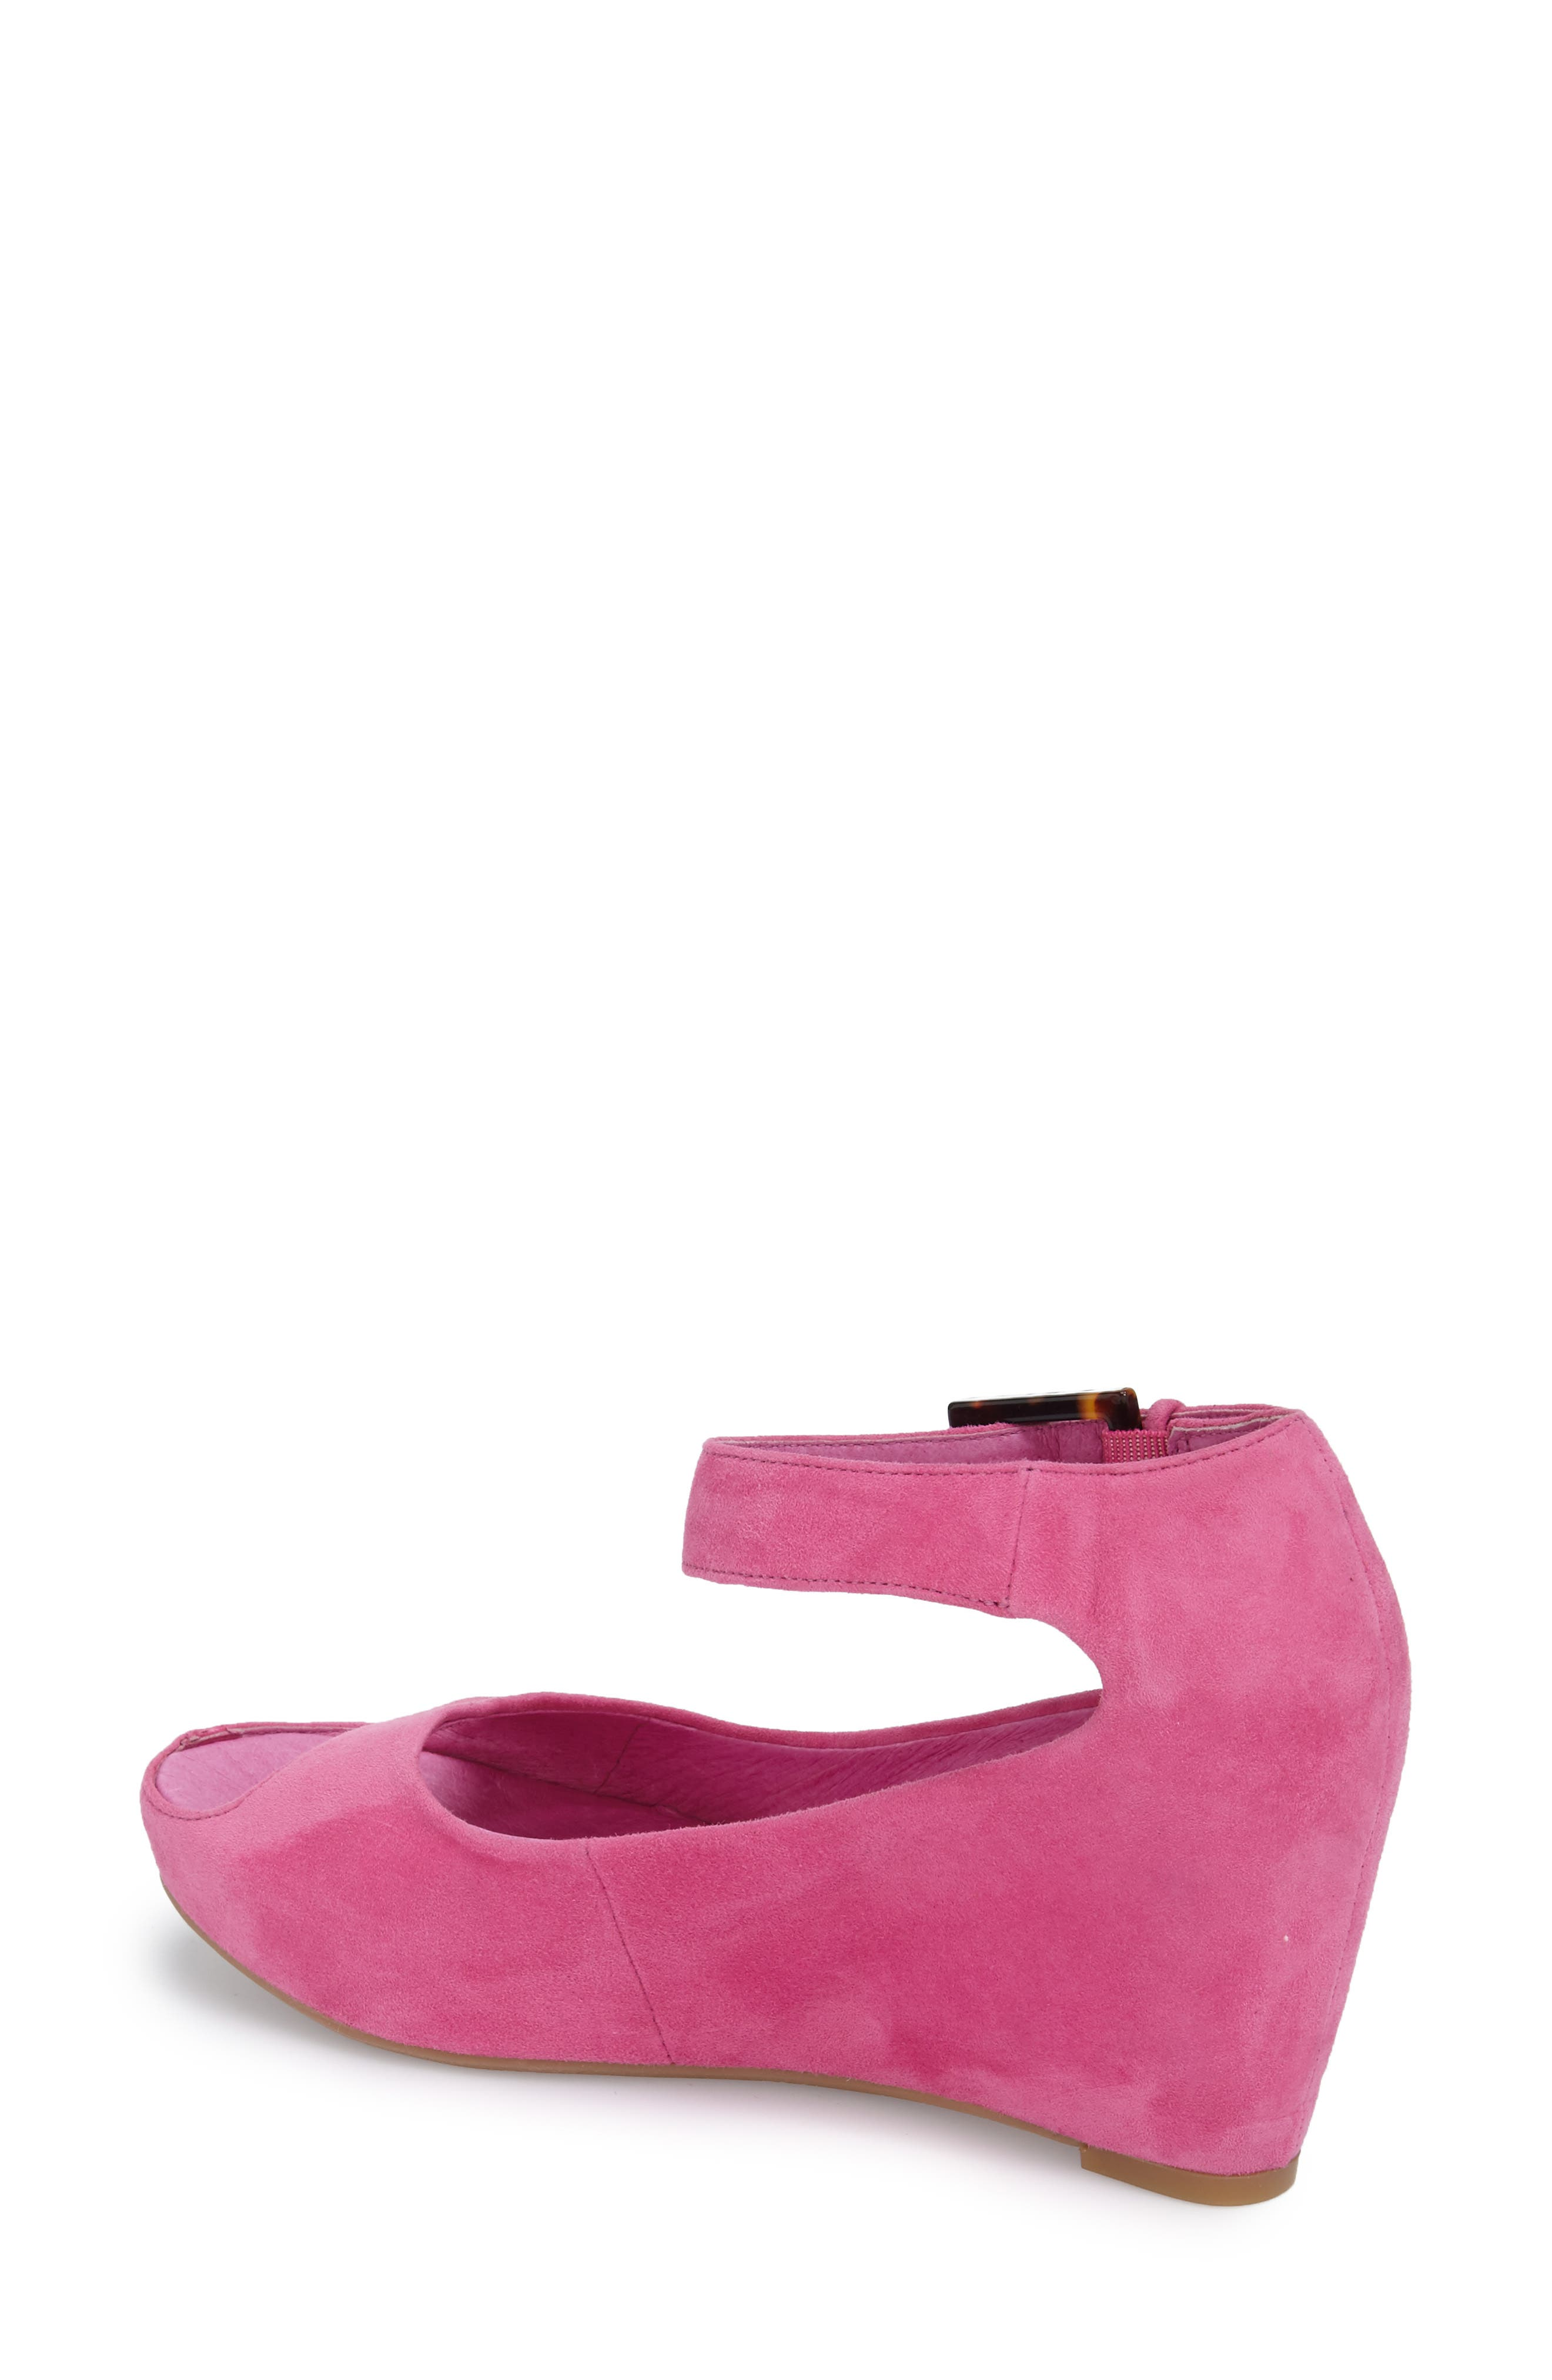 'Tricia' Ankle Strap Sandal,                             Alternate thumbnail 52, color,